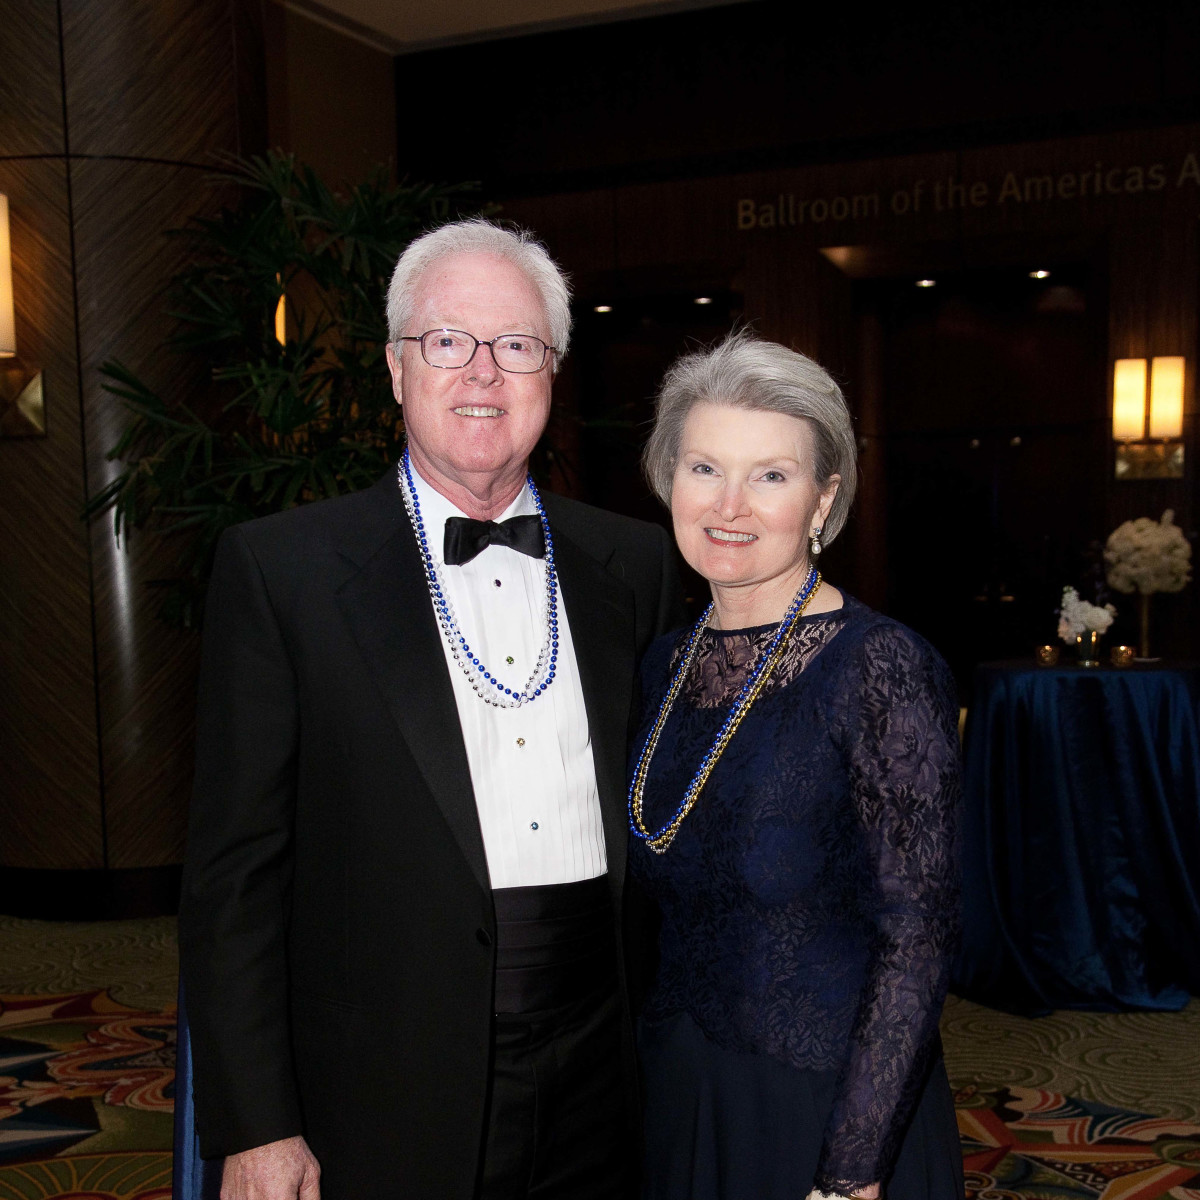 University of St. Thomas Mardi Gras, Feb. 2016, Charlie Chambers, Debbie Chambers